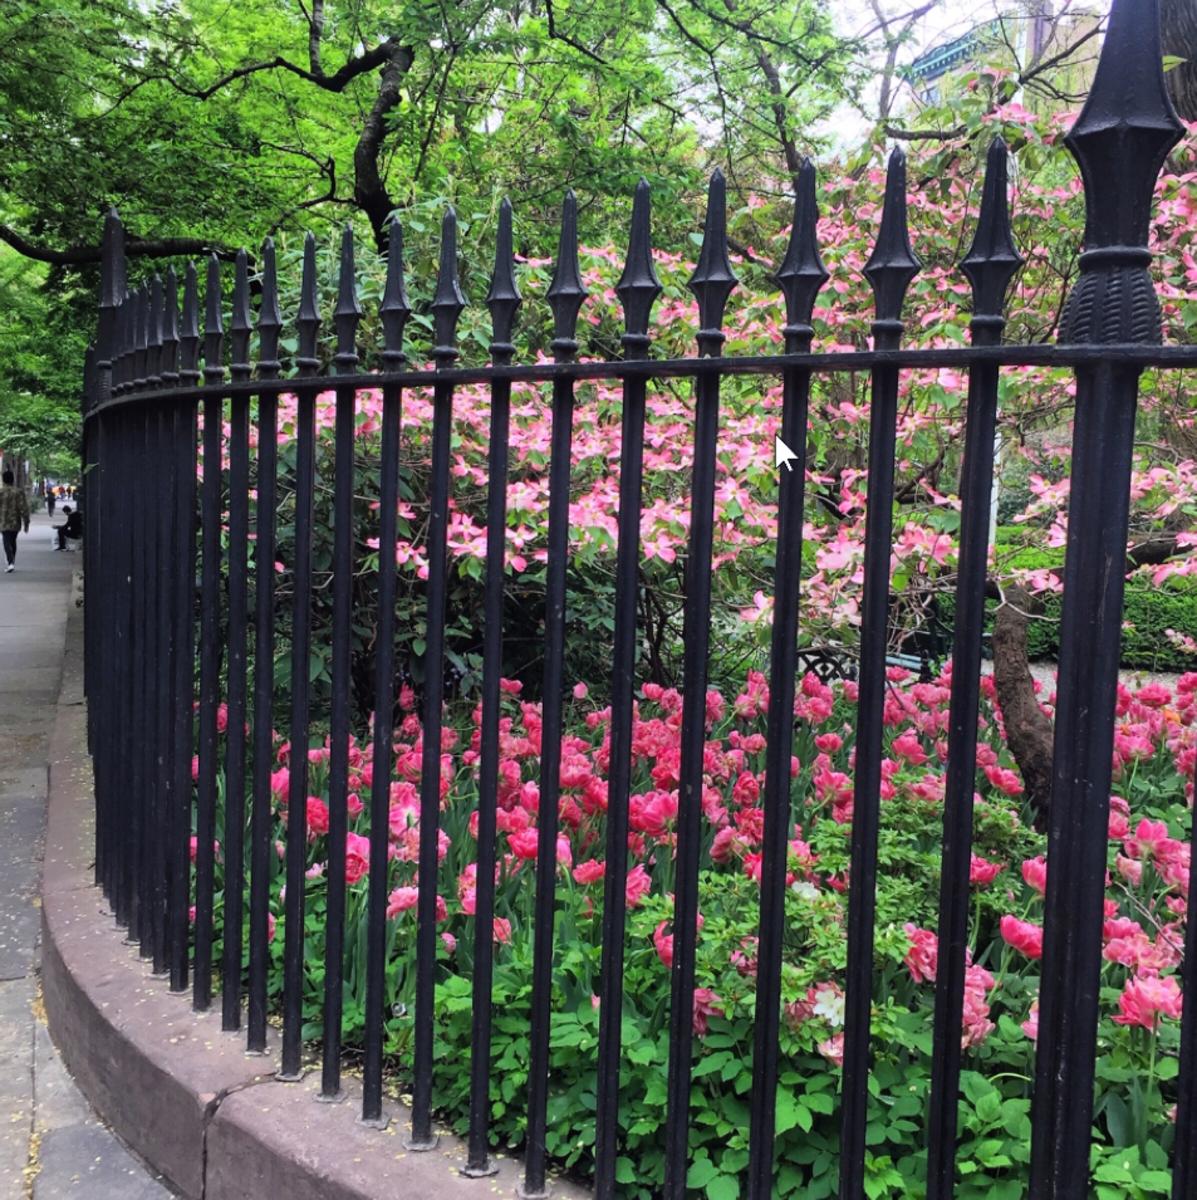 Original Wrought Iron Fence, Gramercy Park, NYC